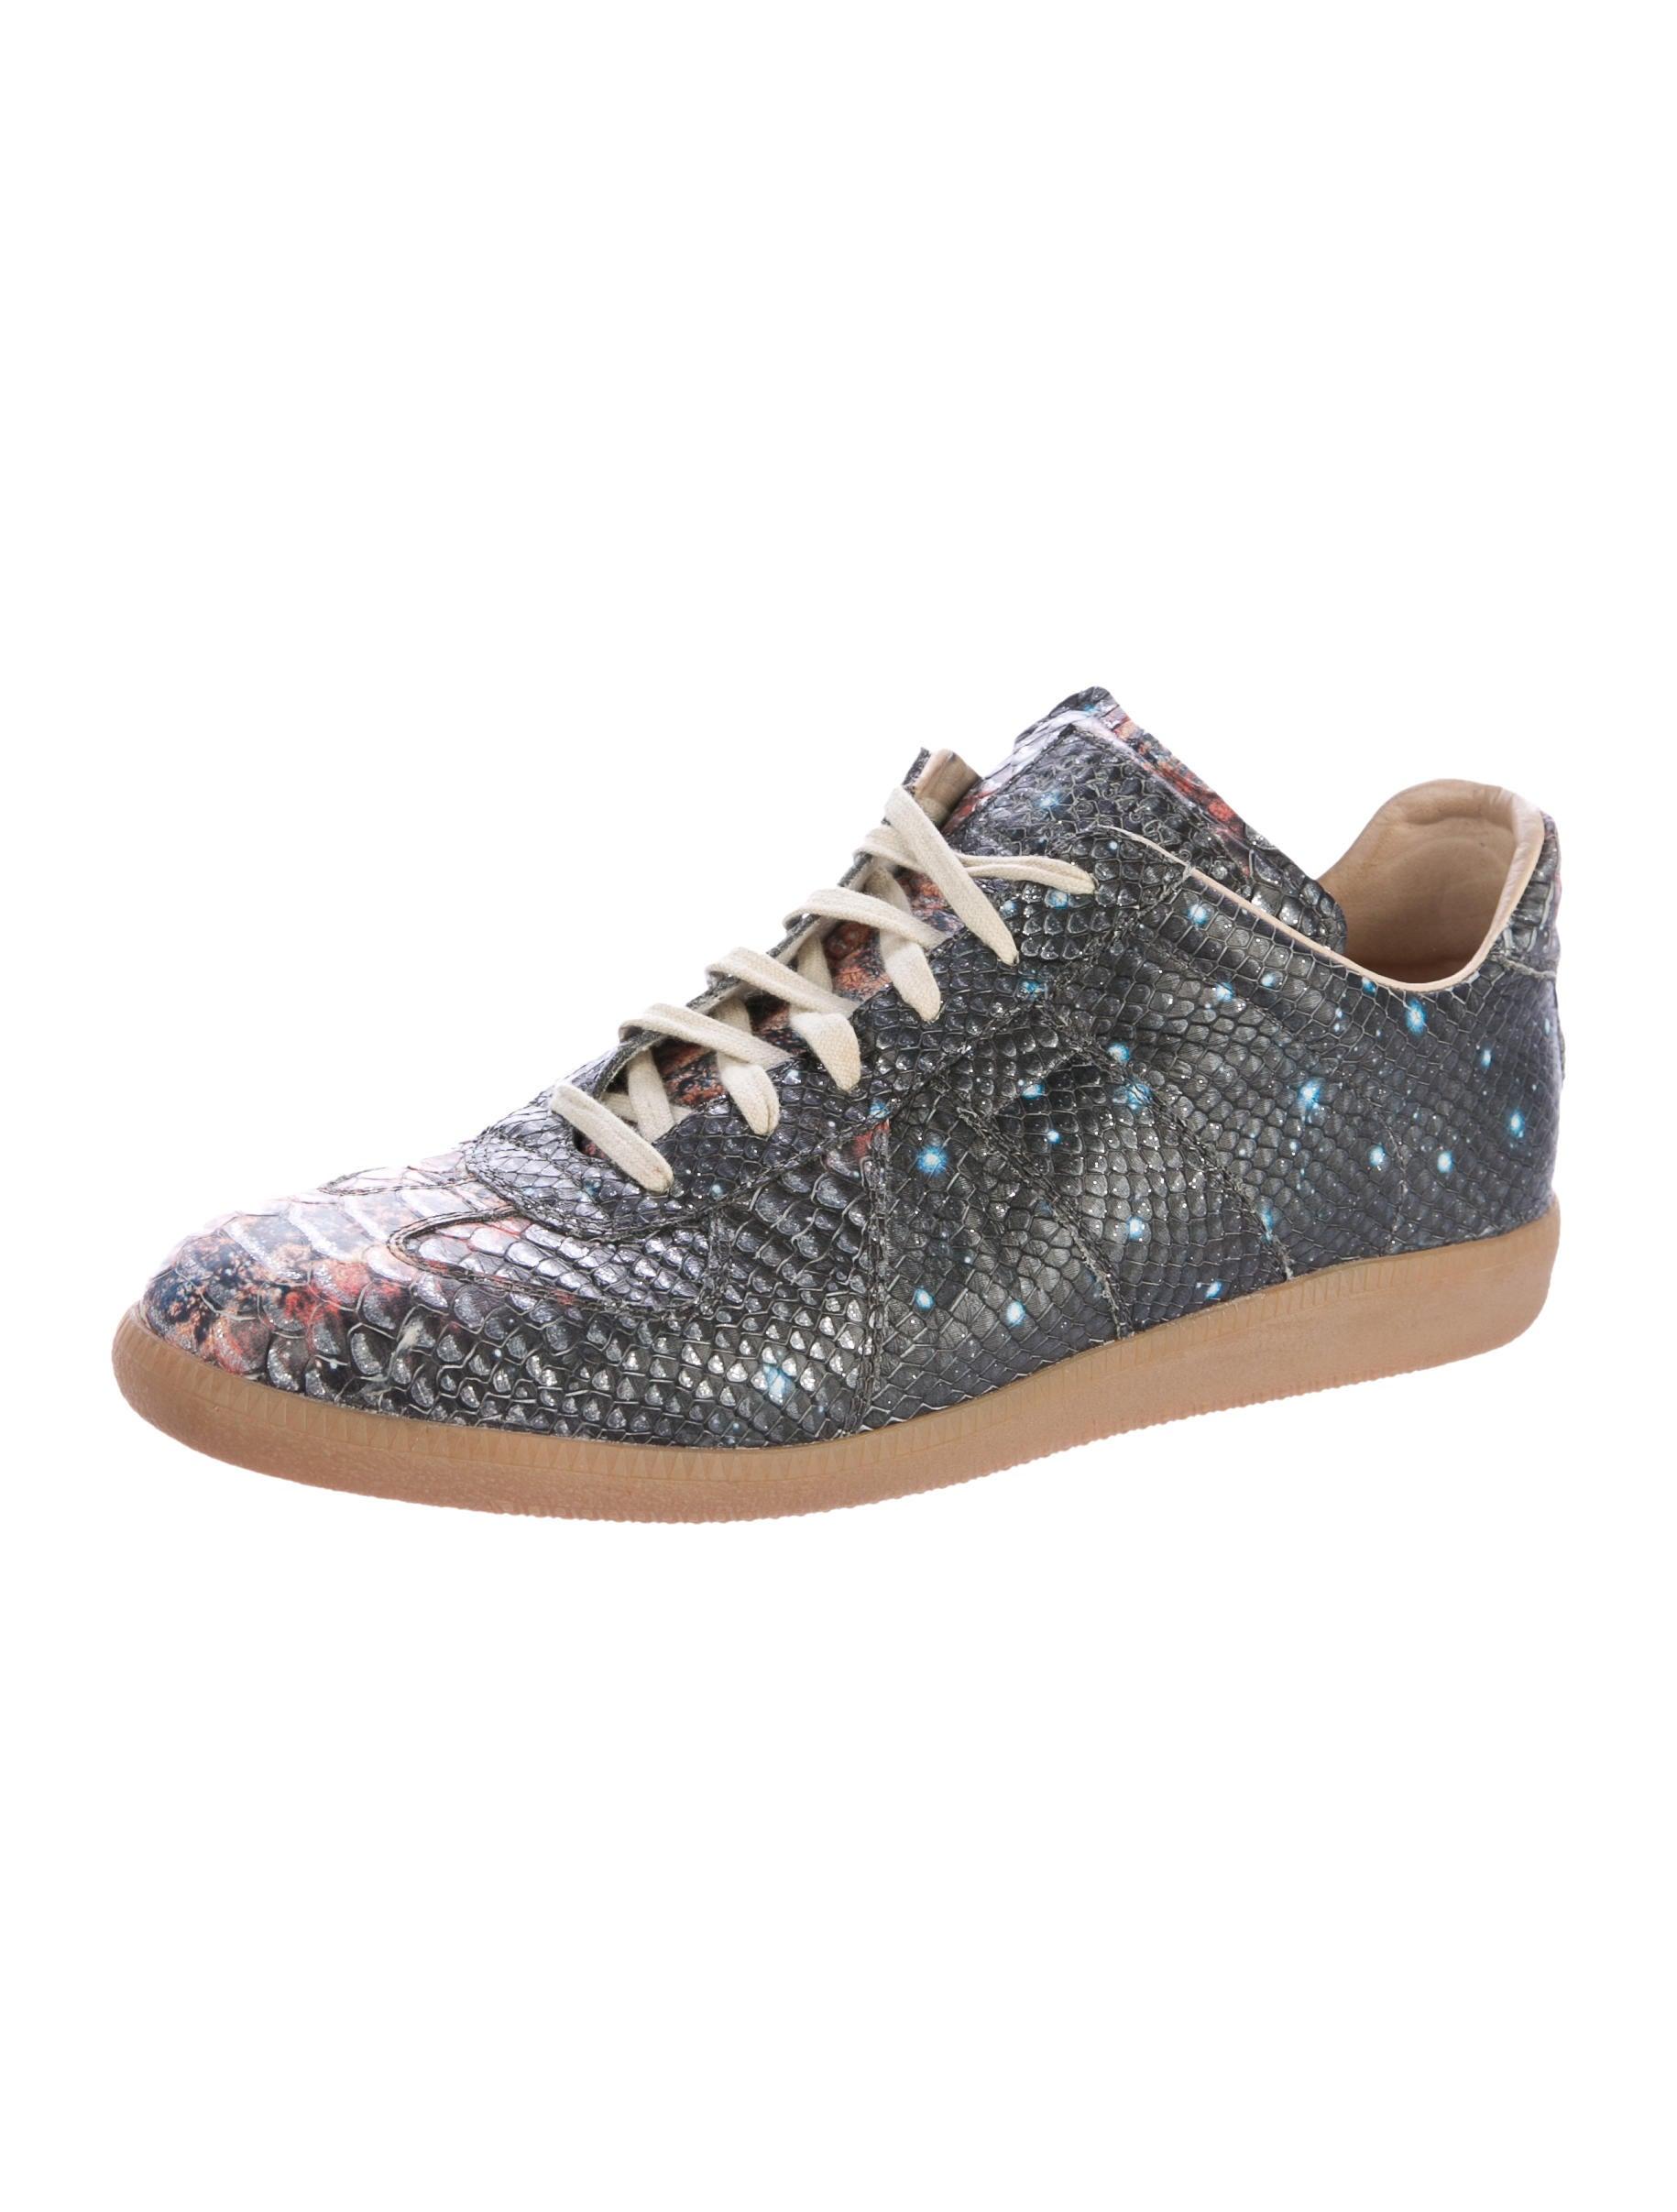 Maison margiela 22 galaxy replica sneakers shoes for Maison margiela 22